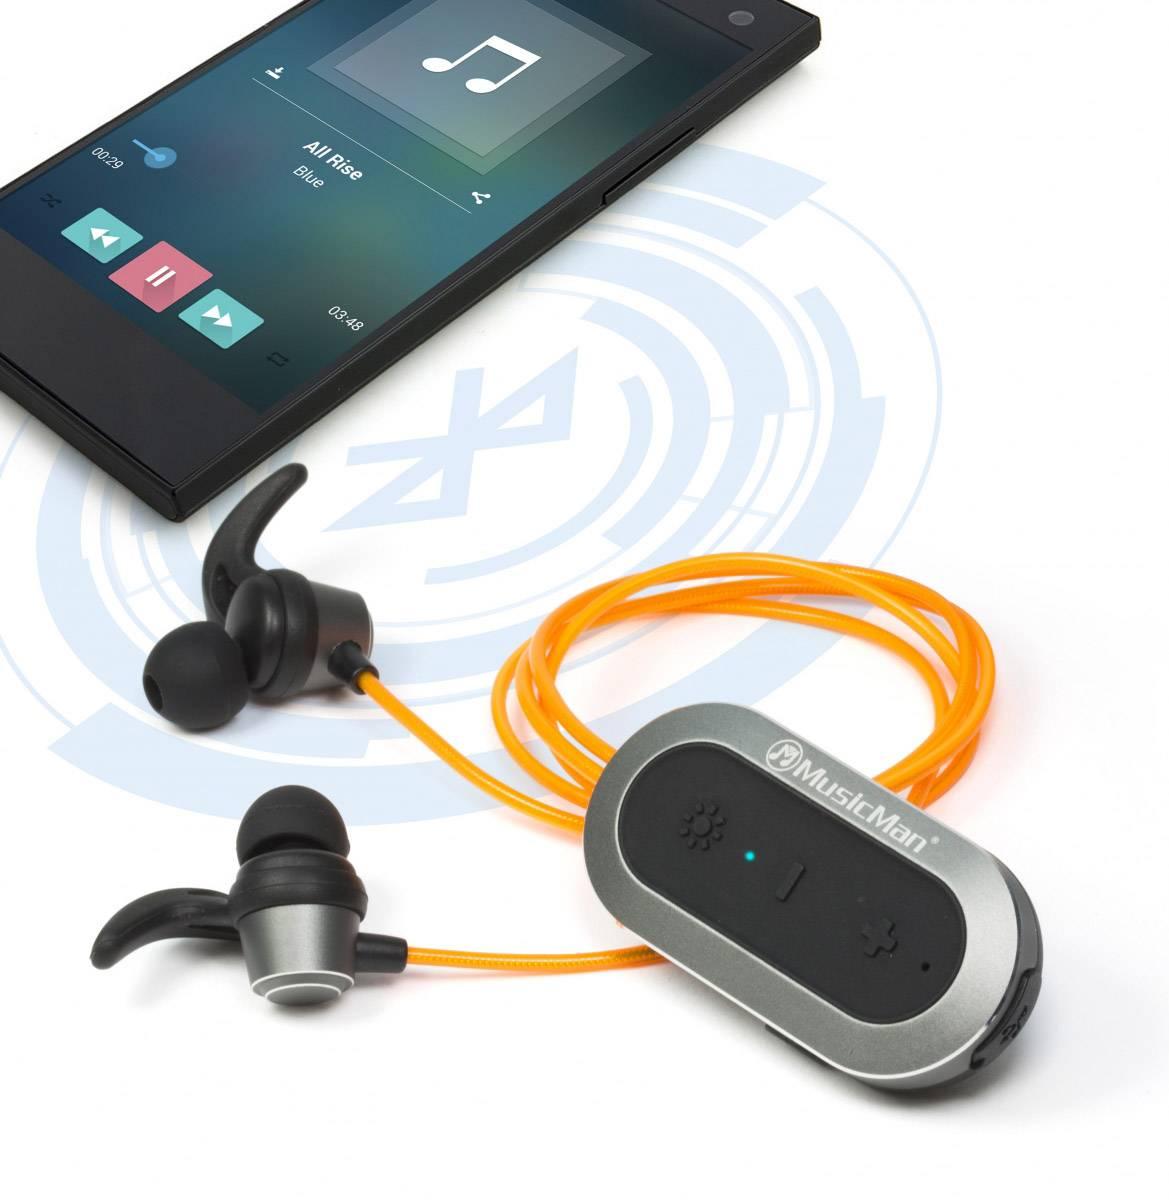 Auricolari Audio Stereo Bluetooth con Vivavoce ...